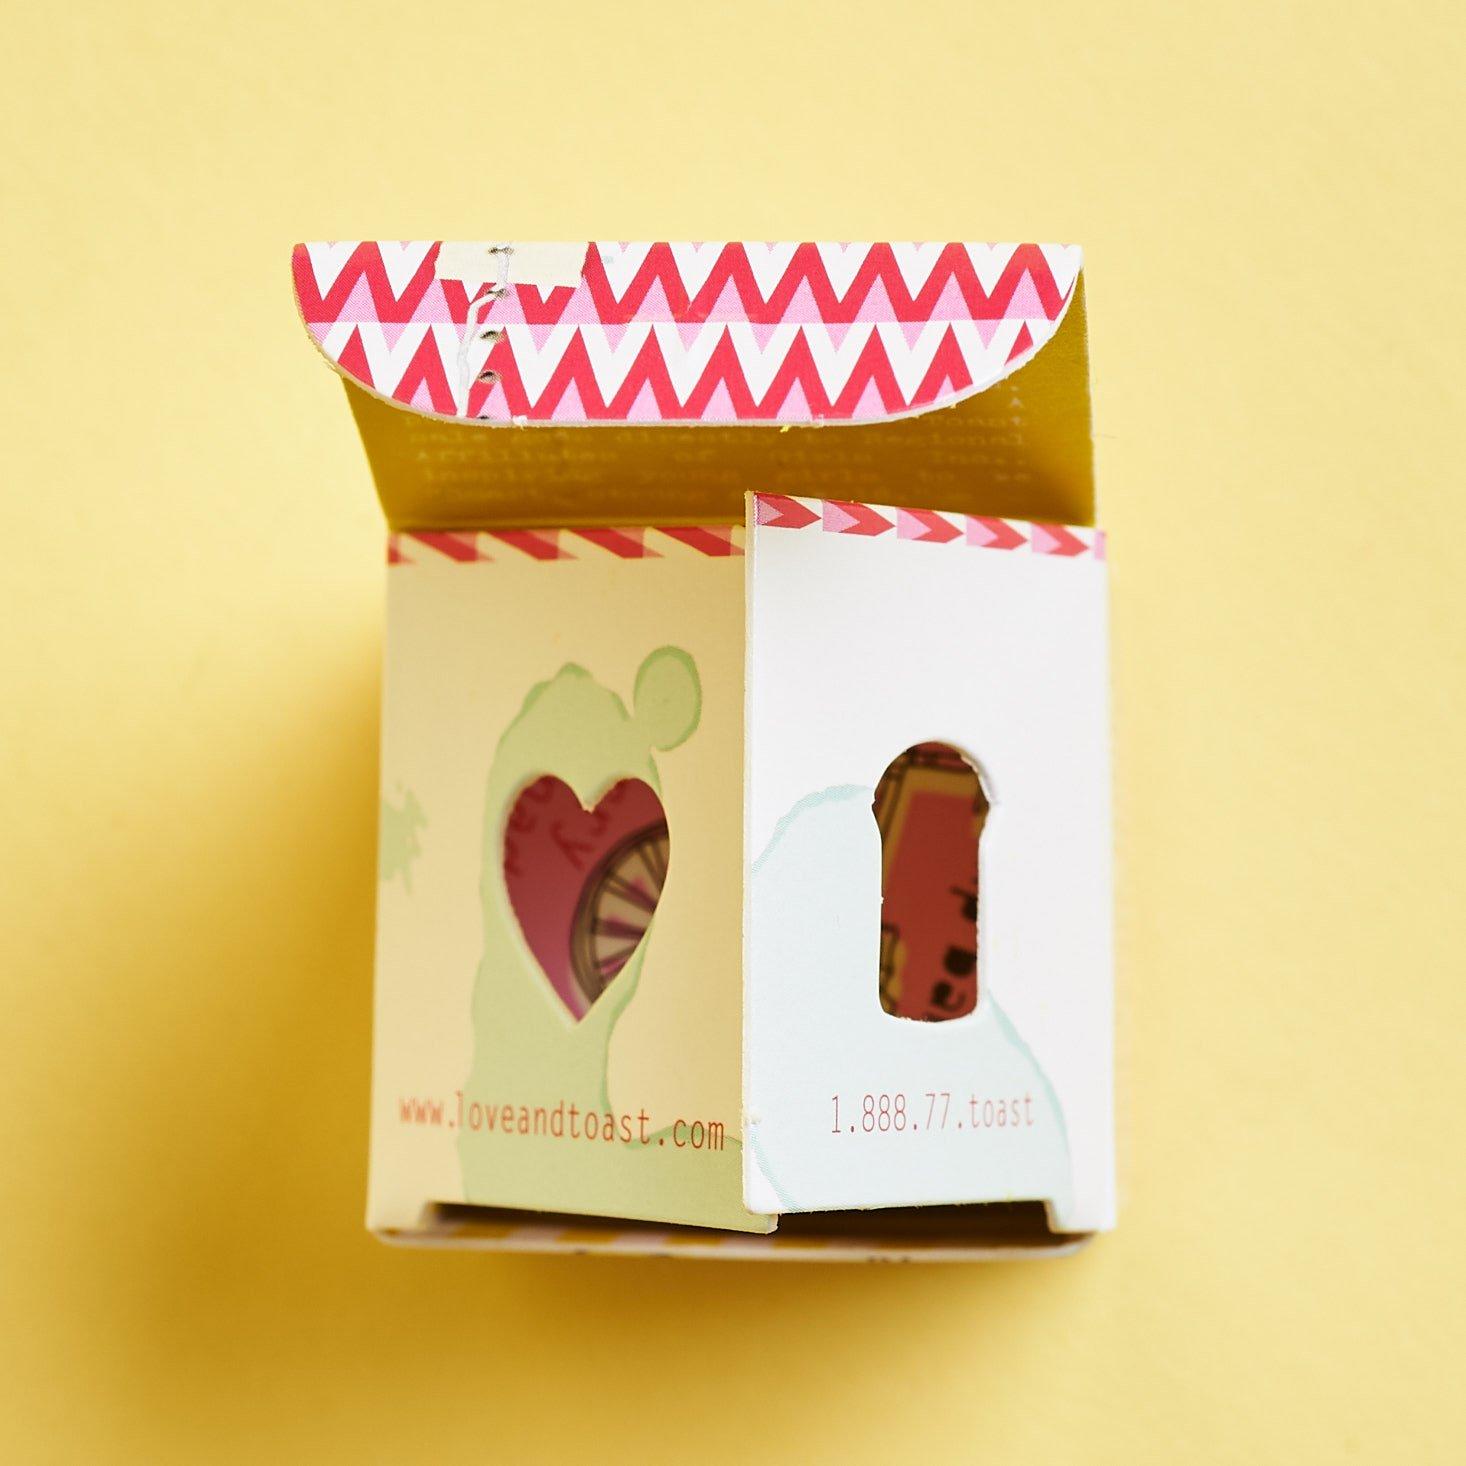 Margot Elena June 2019 review lippy packaging